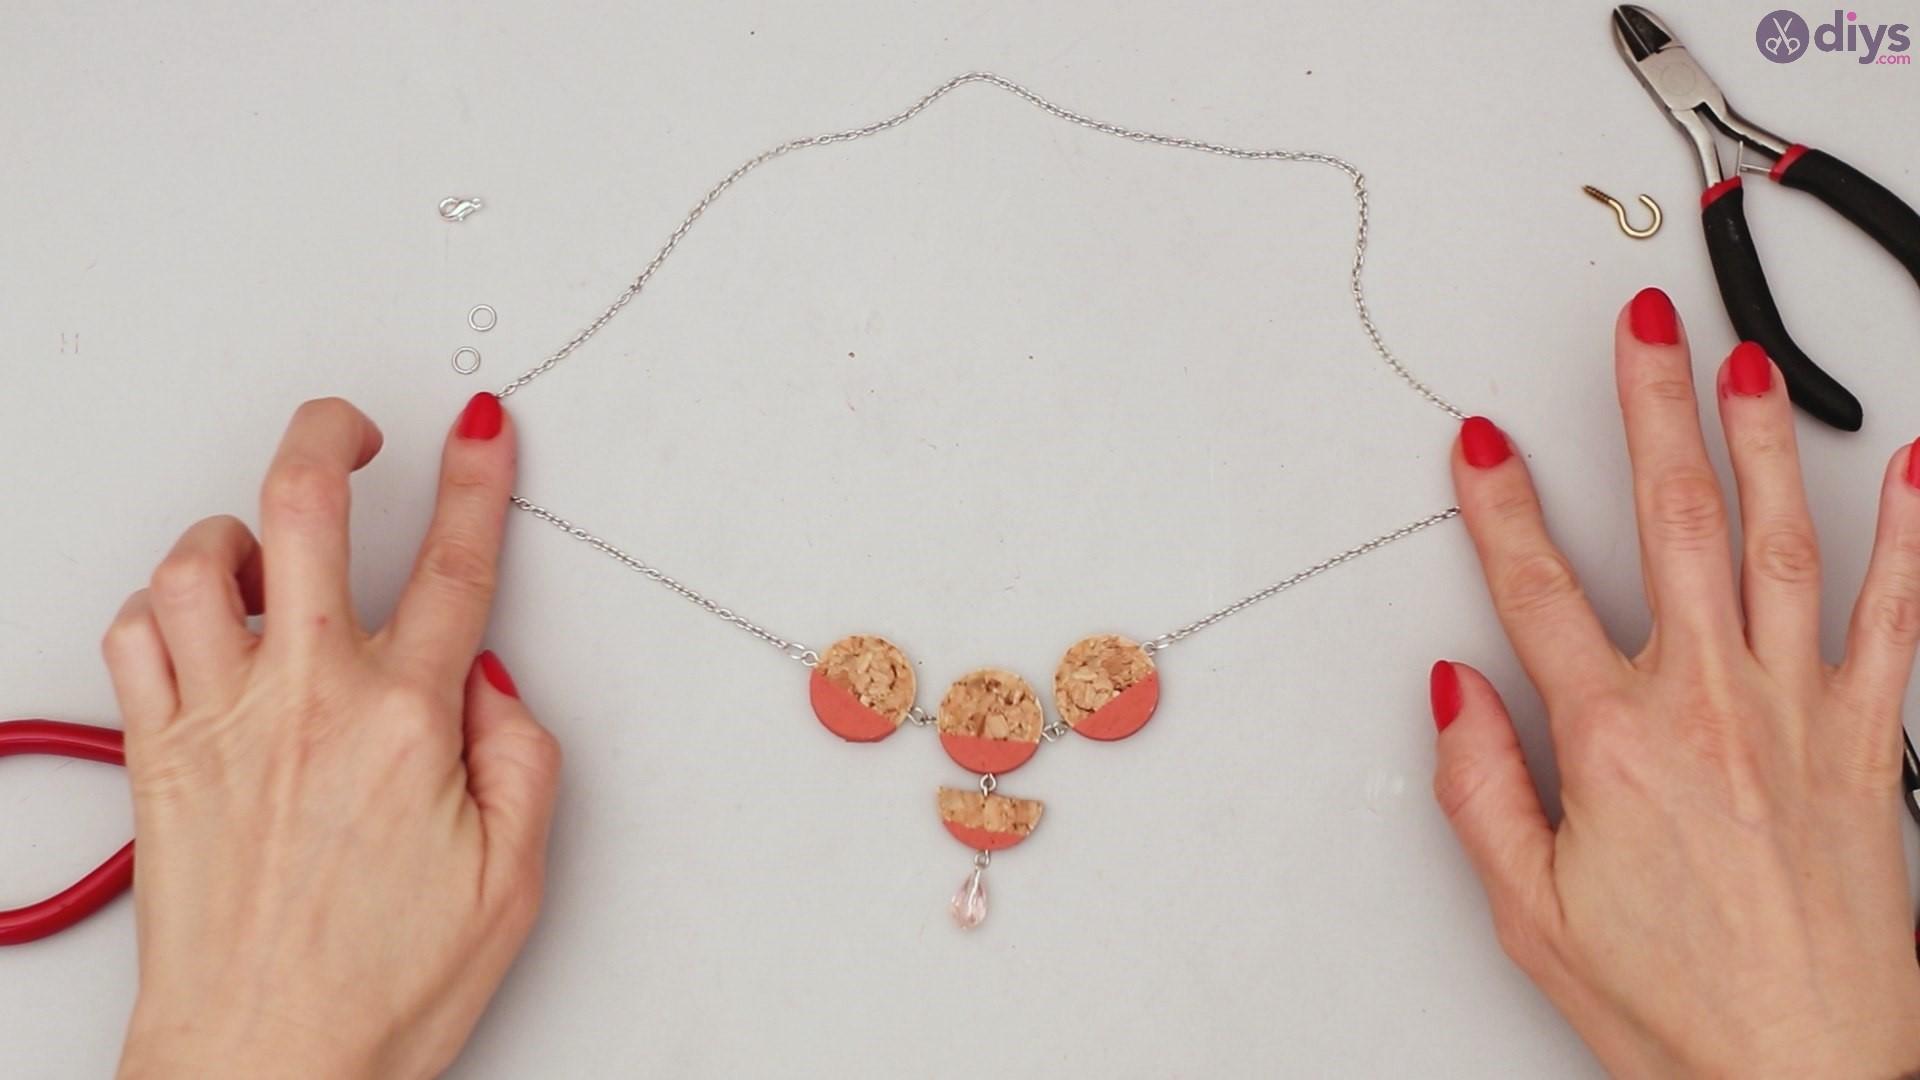 Diy wine cork necklace (44)